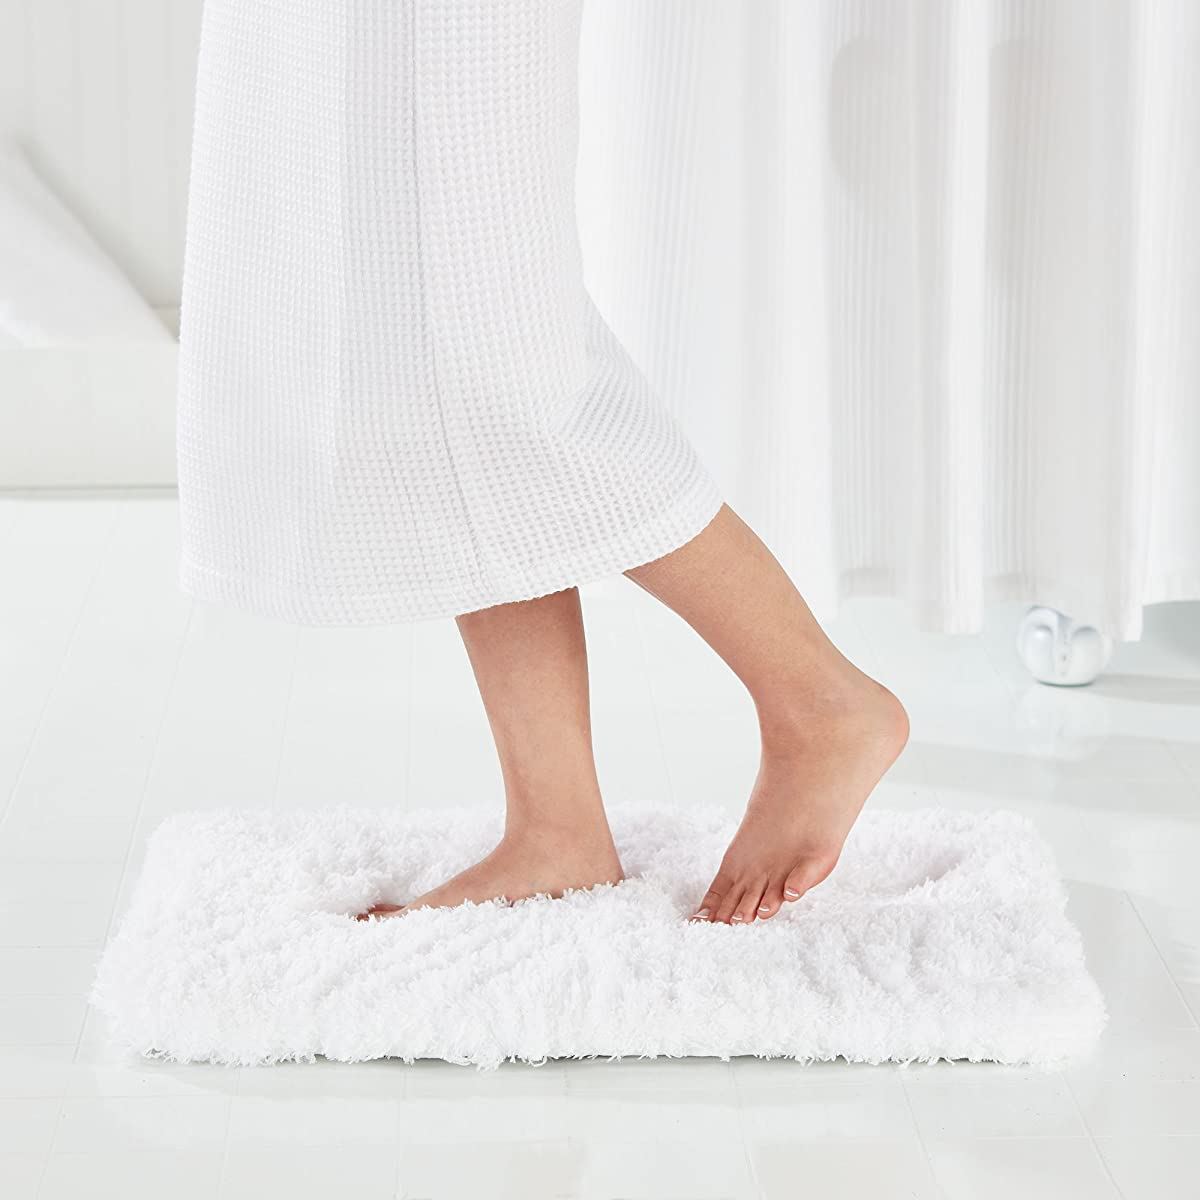 "Genteele Memory Foam Bath Mat Shaggy Bathroom Mat, Non-Slip, Water Absorbent, Super Plush, Washable Bathroom Rug, 21"" X 34"", White"